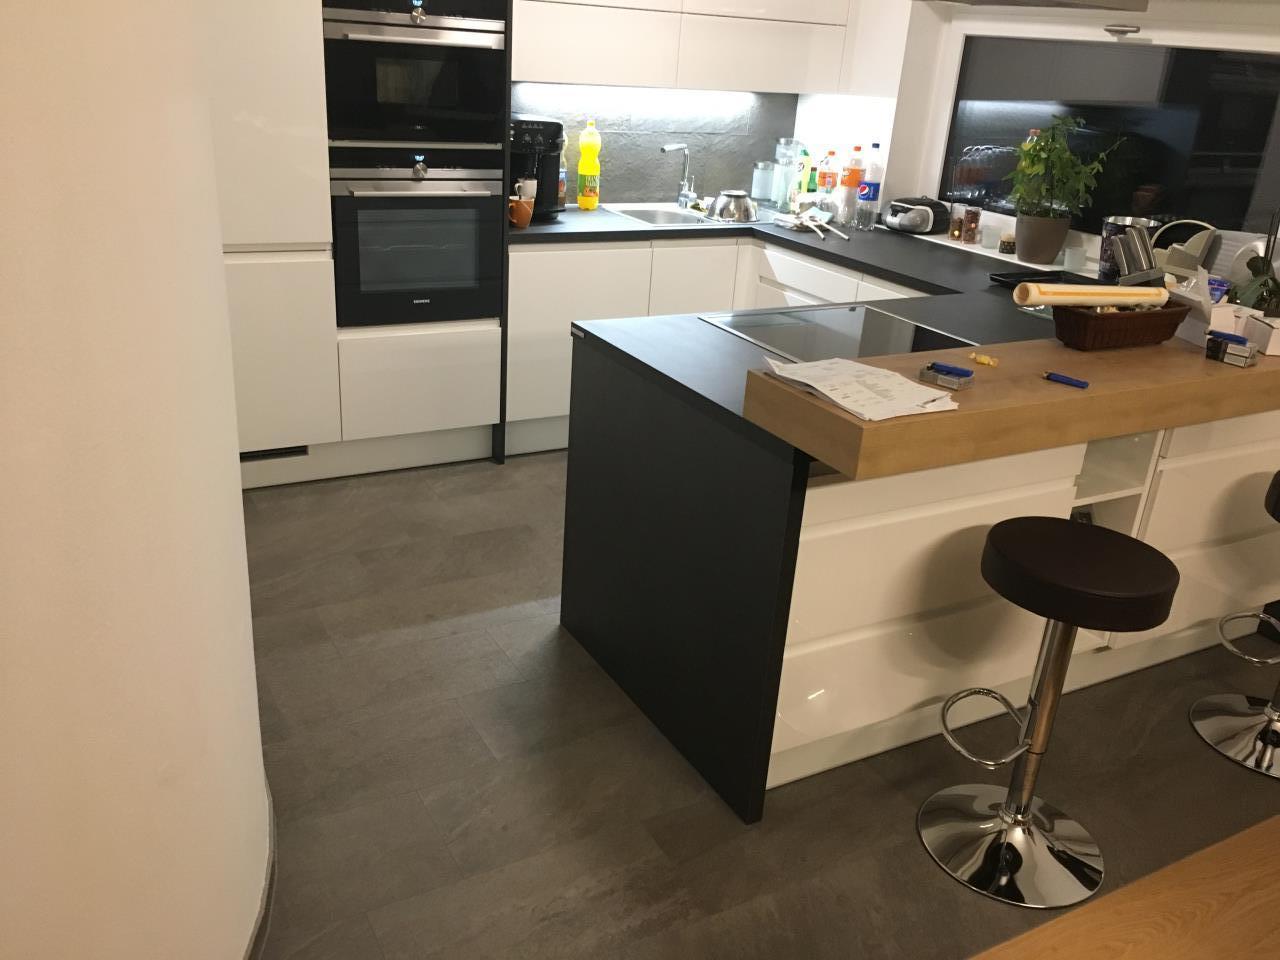 Full Size of Bodenbelag Für Offene Küche Bodenbelag In Der Küche Boden Weiße Küche Bodenbelag Für Küche Und Esszimmer Küche Bodenbelag Küche